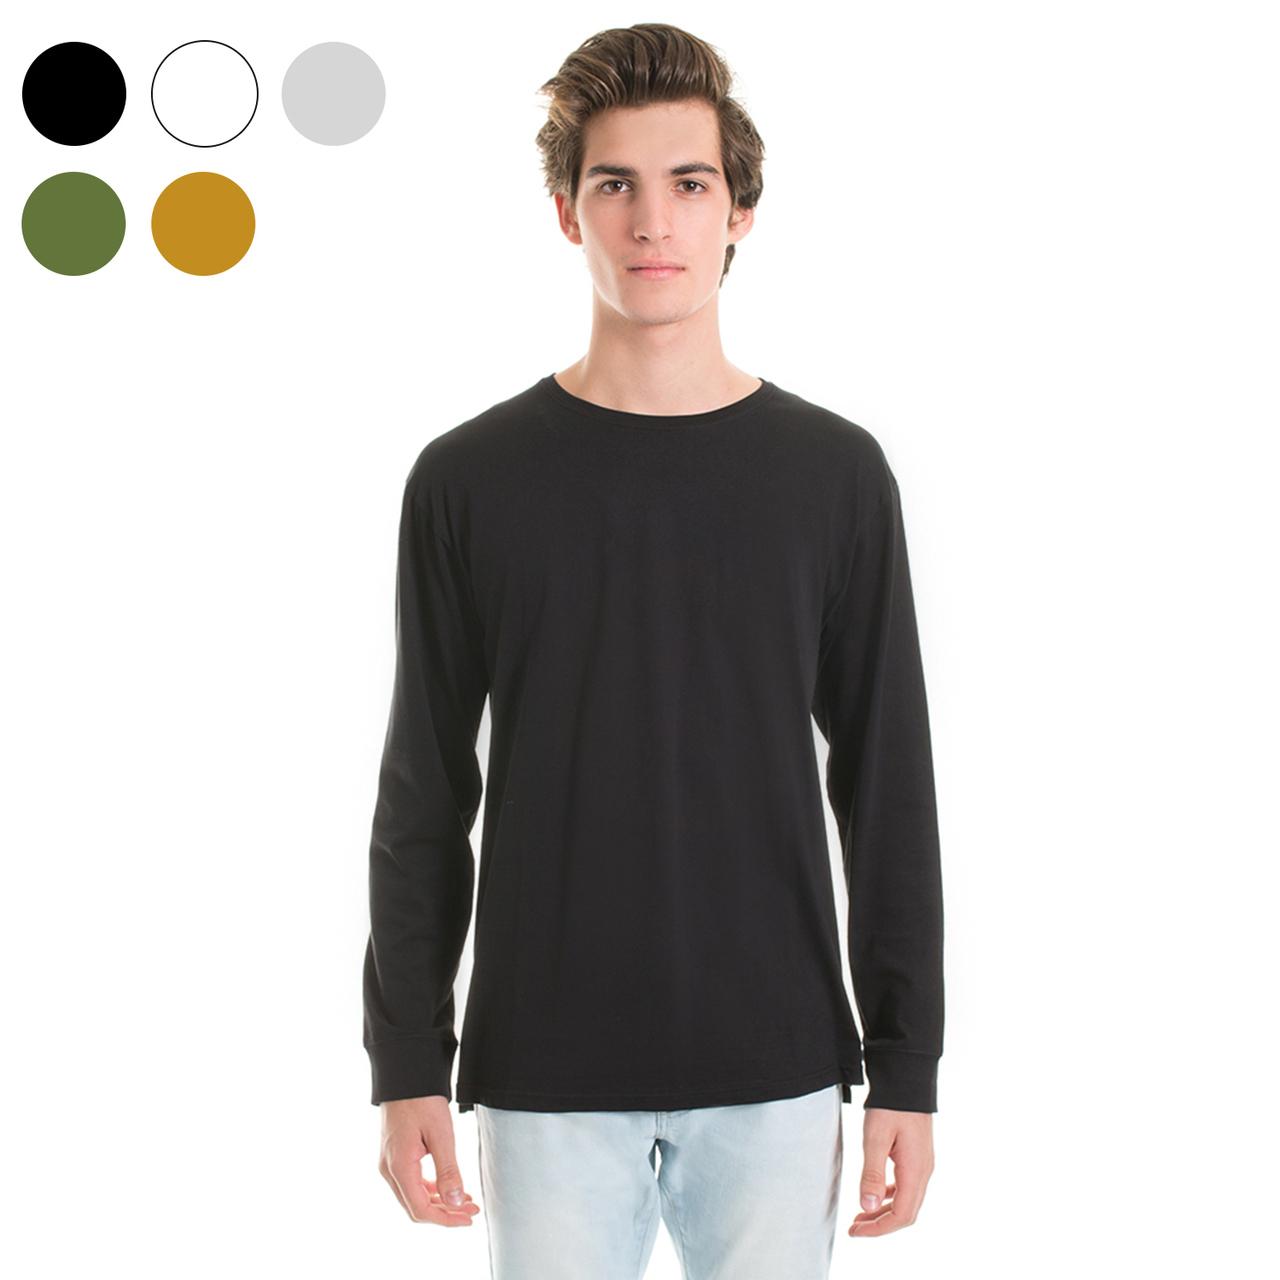 Plain black t shirt quality - New Mens Plain Blank Longsleeve T Shirt 100